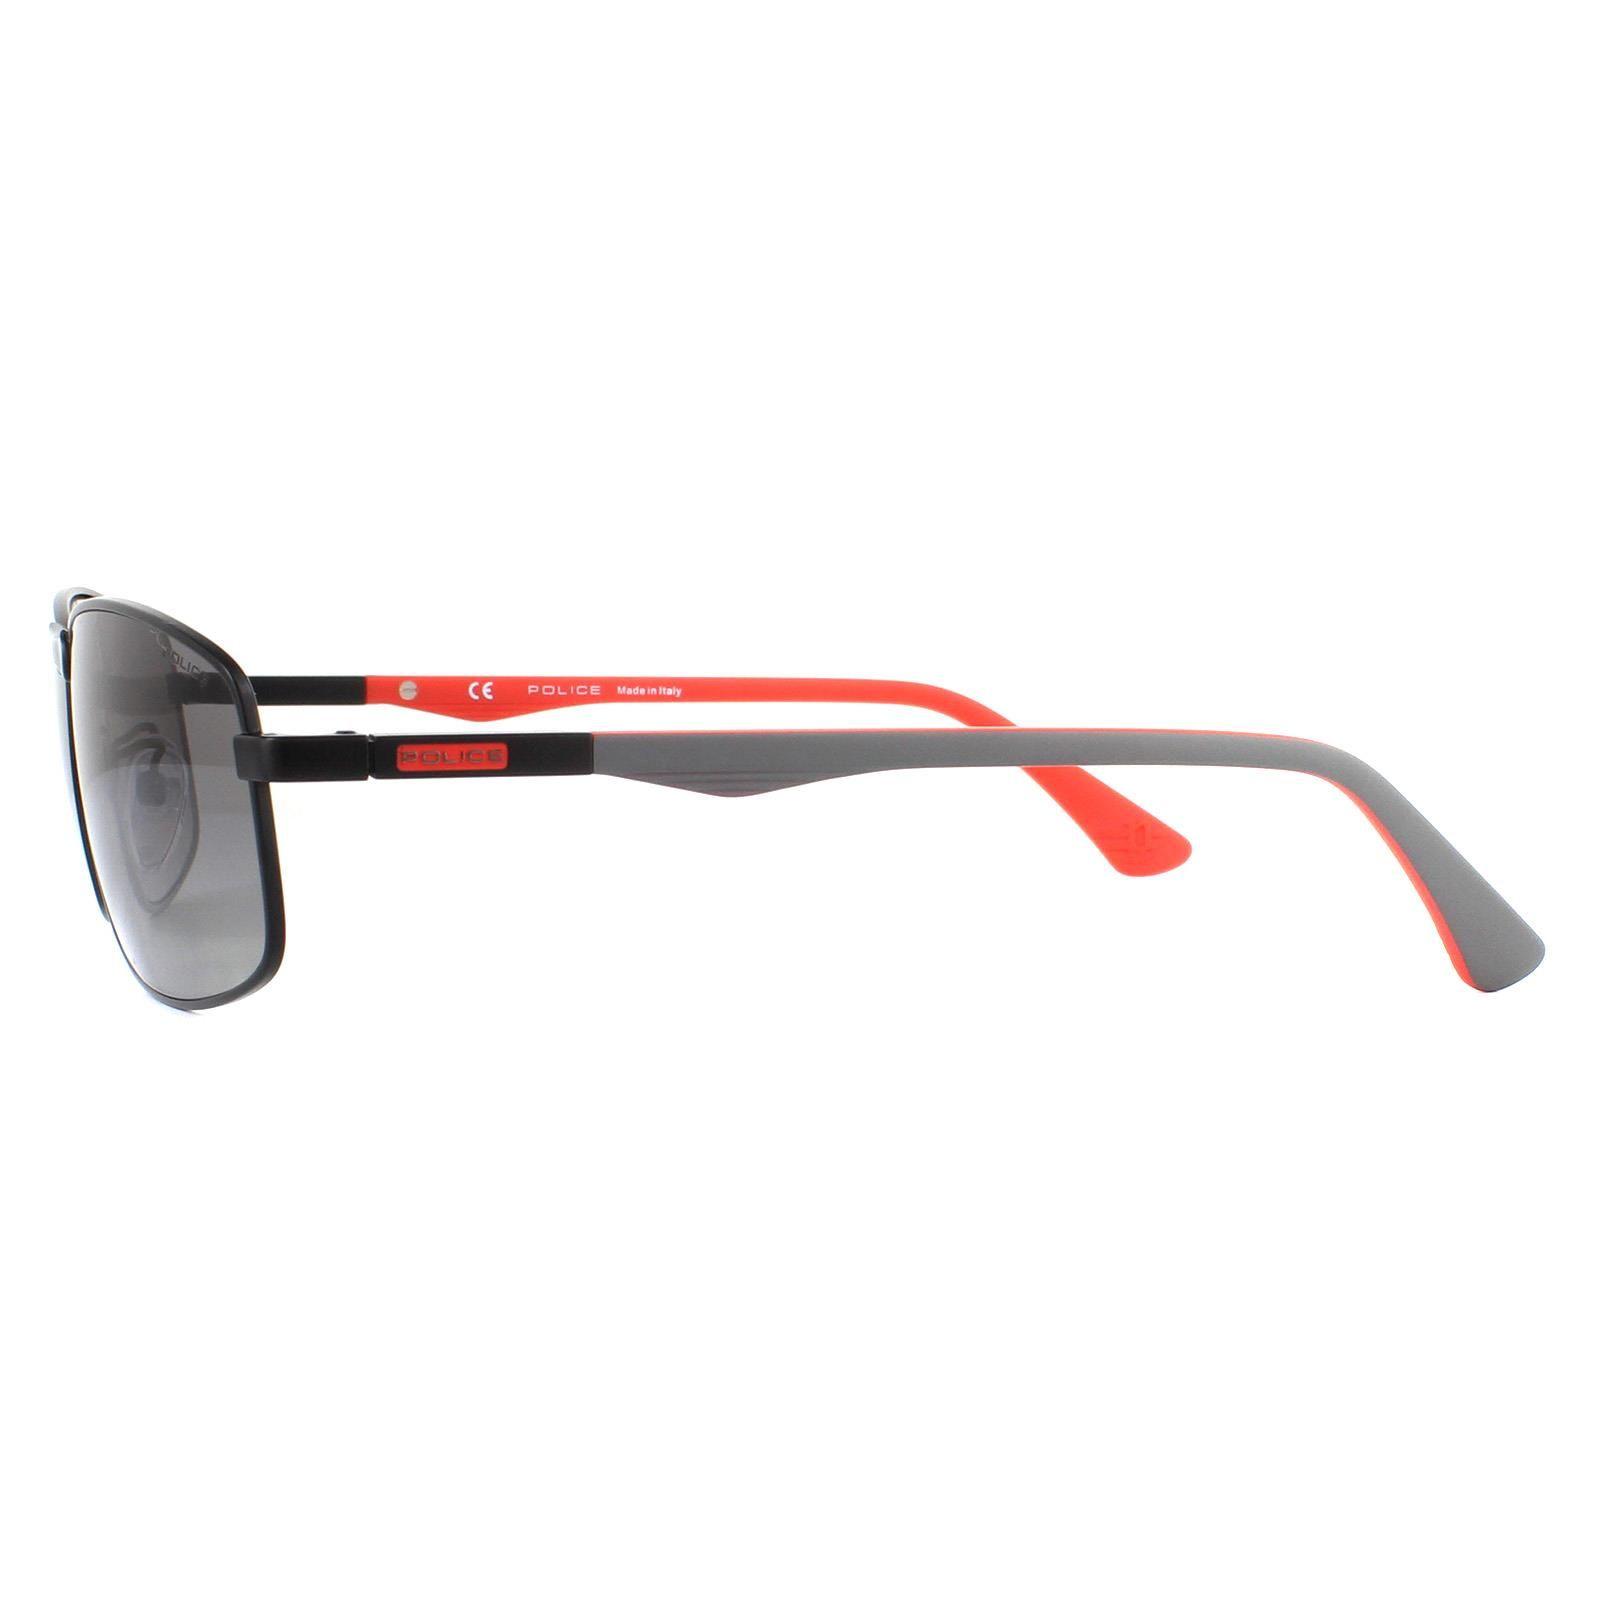 Police Sunglasses Brooklyn 8 SPL530 531Z Semi Matte Black Red Grey Gradient Polarized